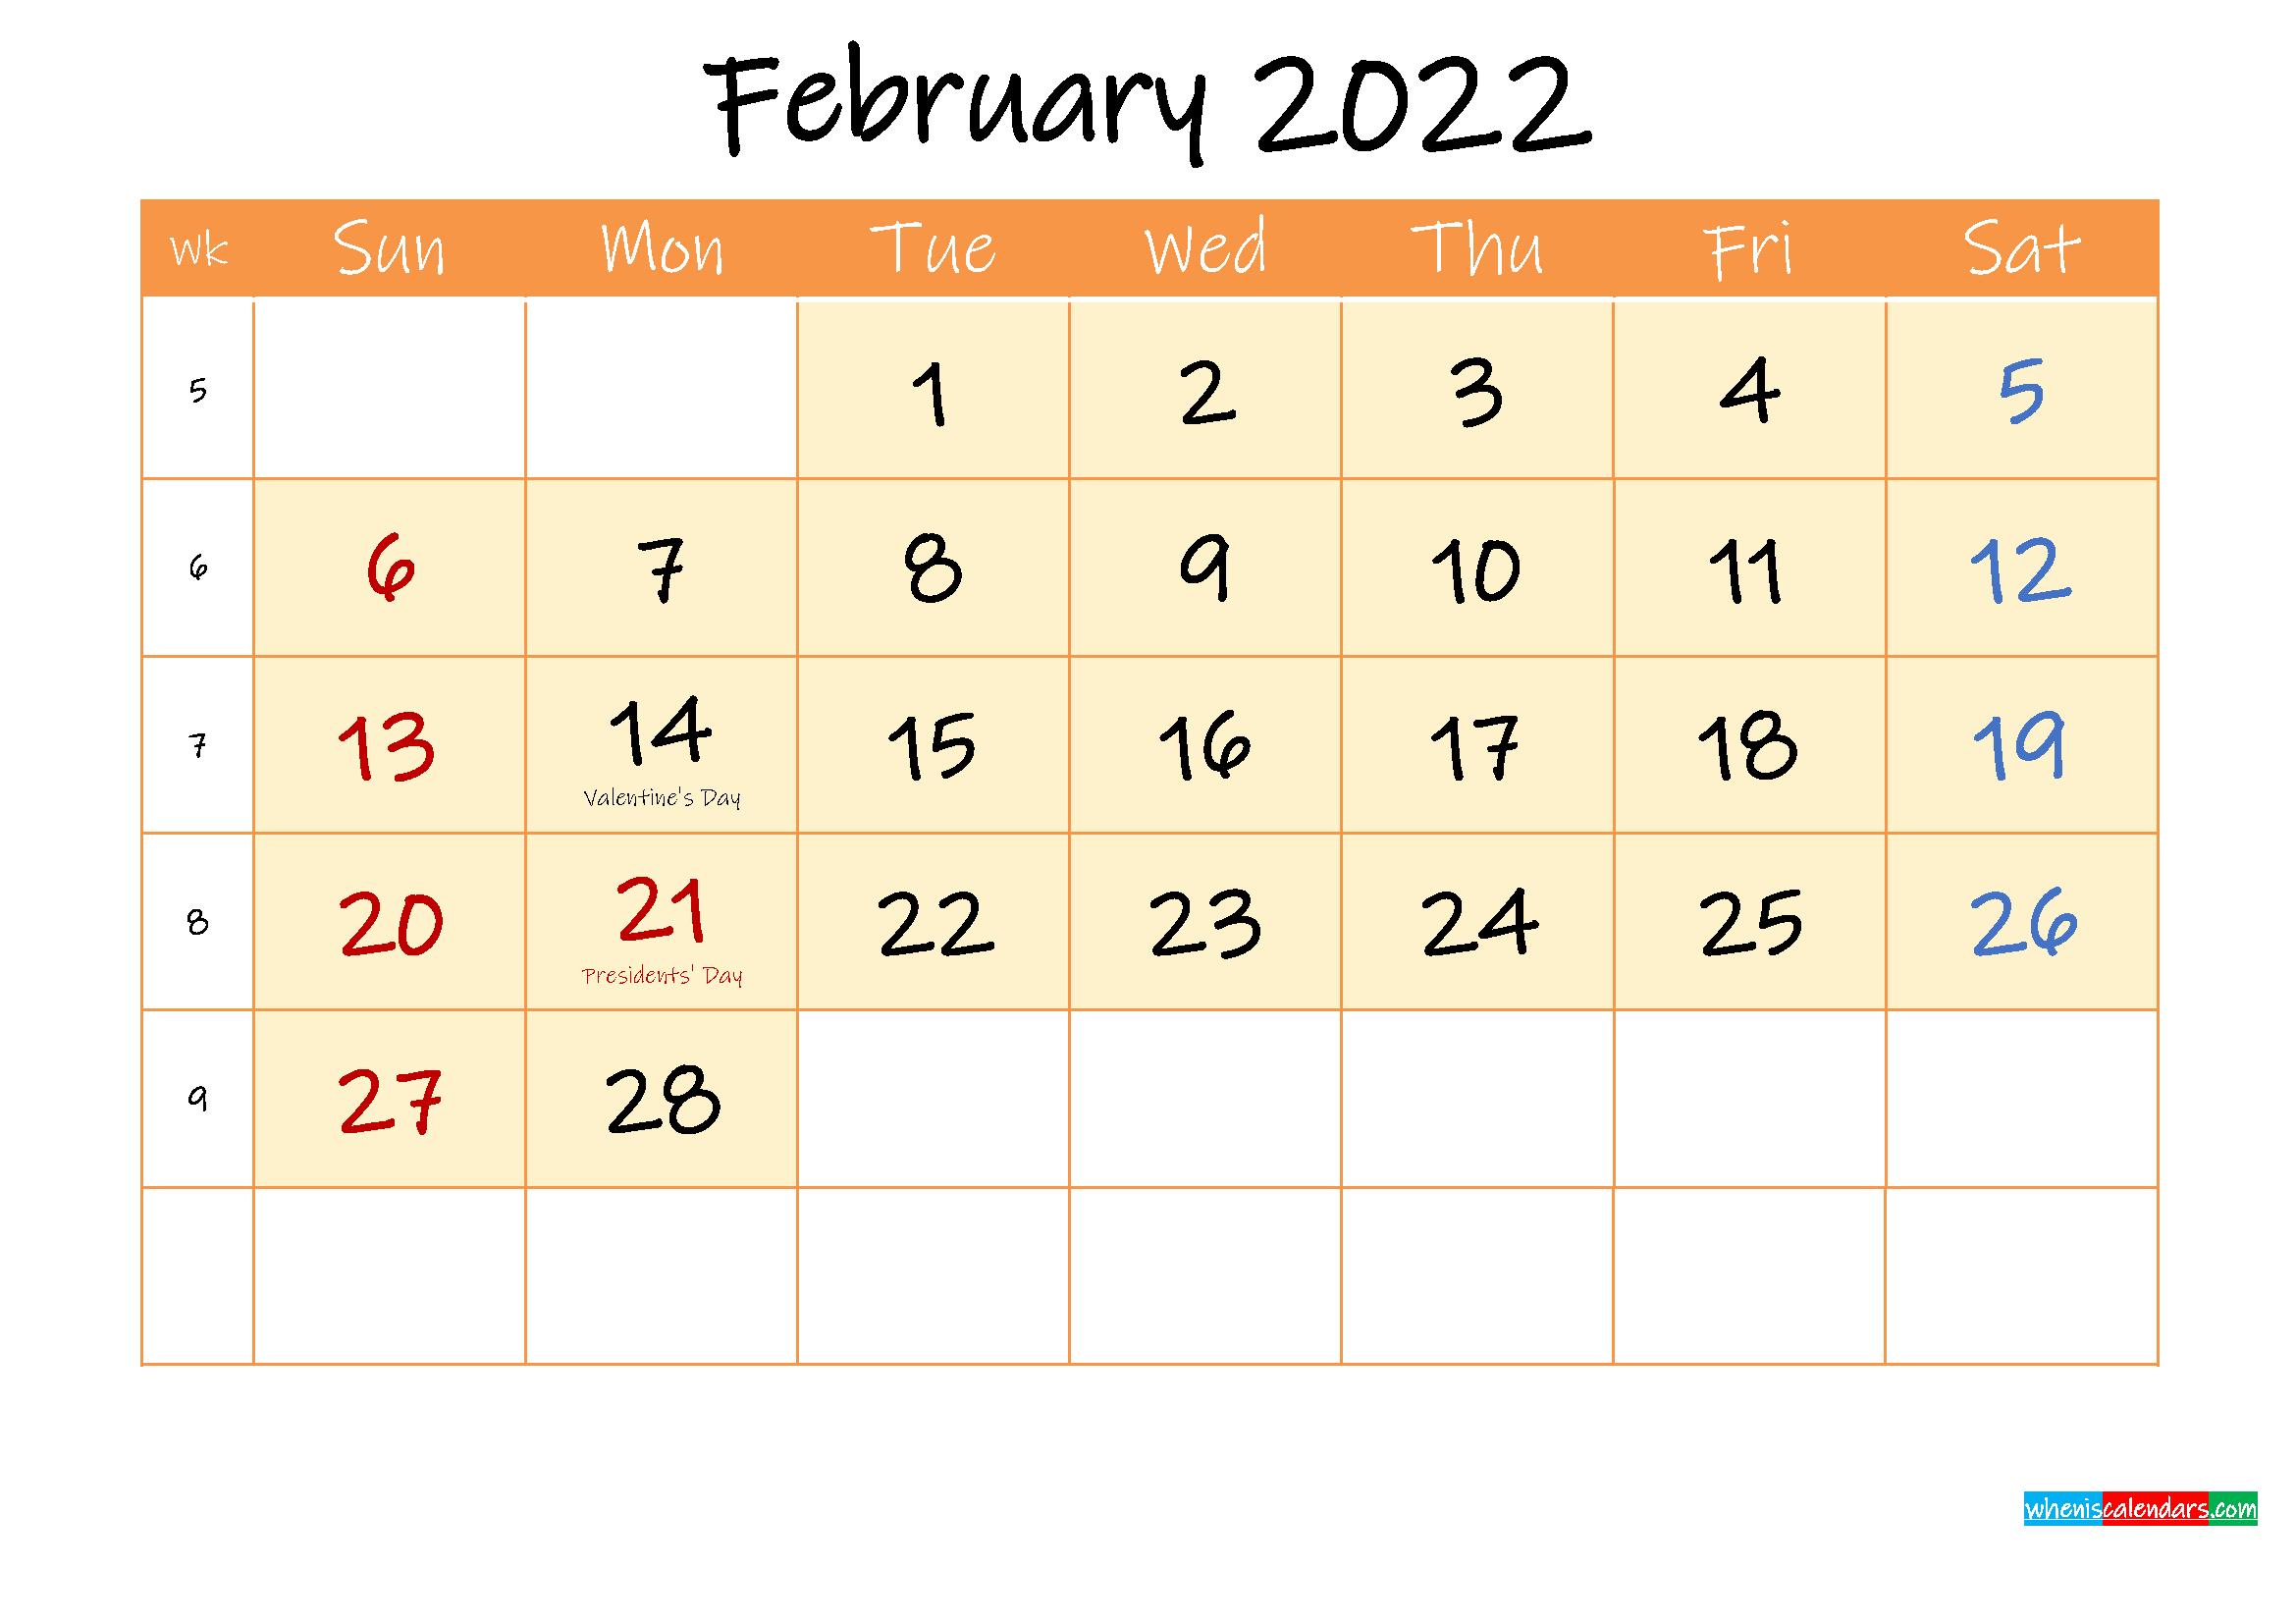 February 2022 Free Printable Calendar - Template Ink22M158 throughout February 2022 Calendar Holidays